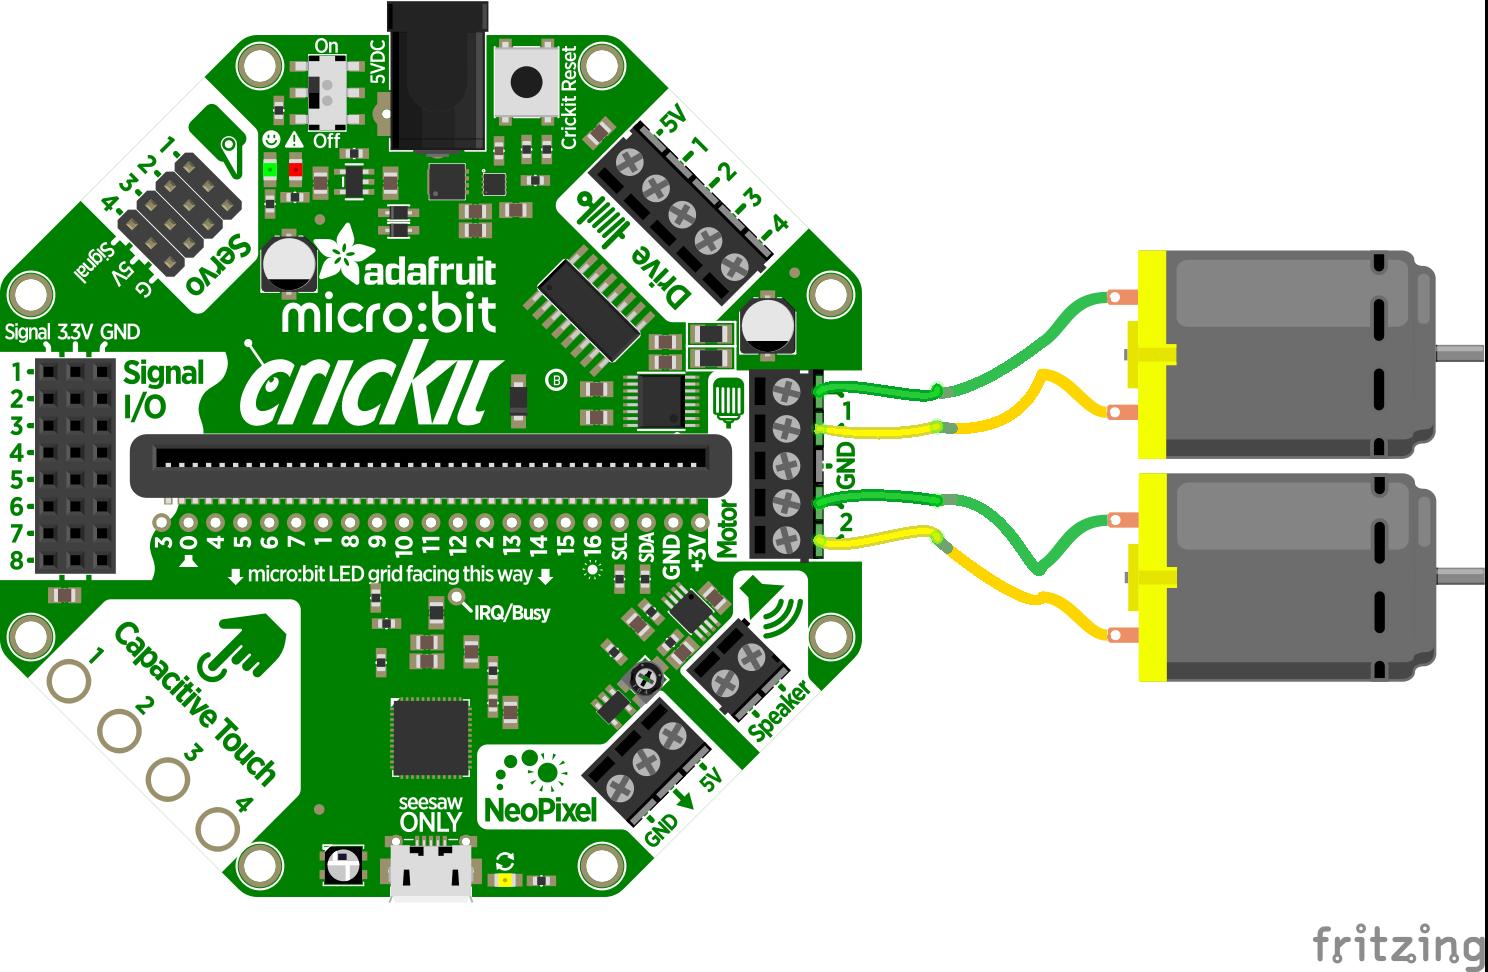 circuit_playground_microbit-dcmotors_bb.png